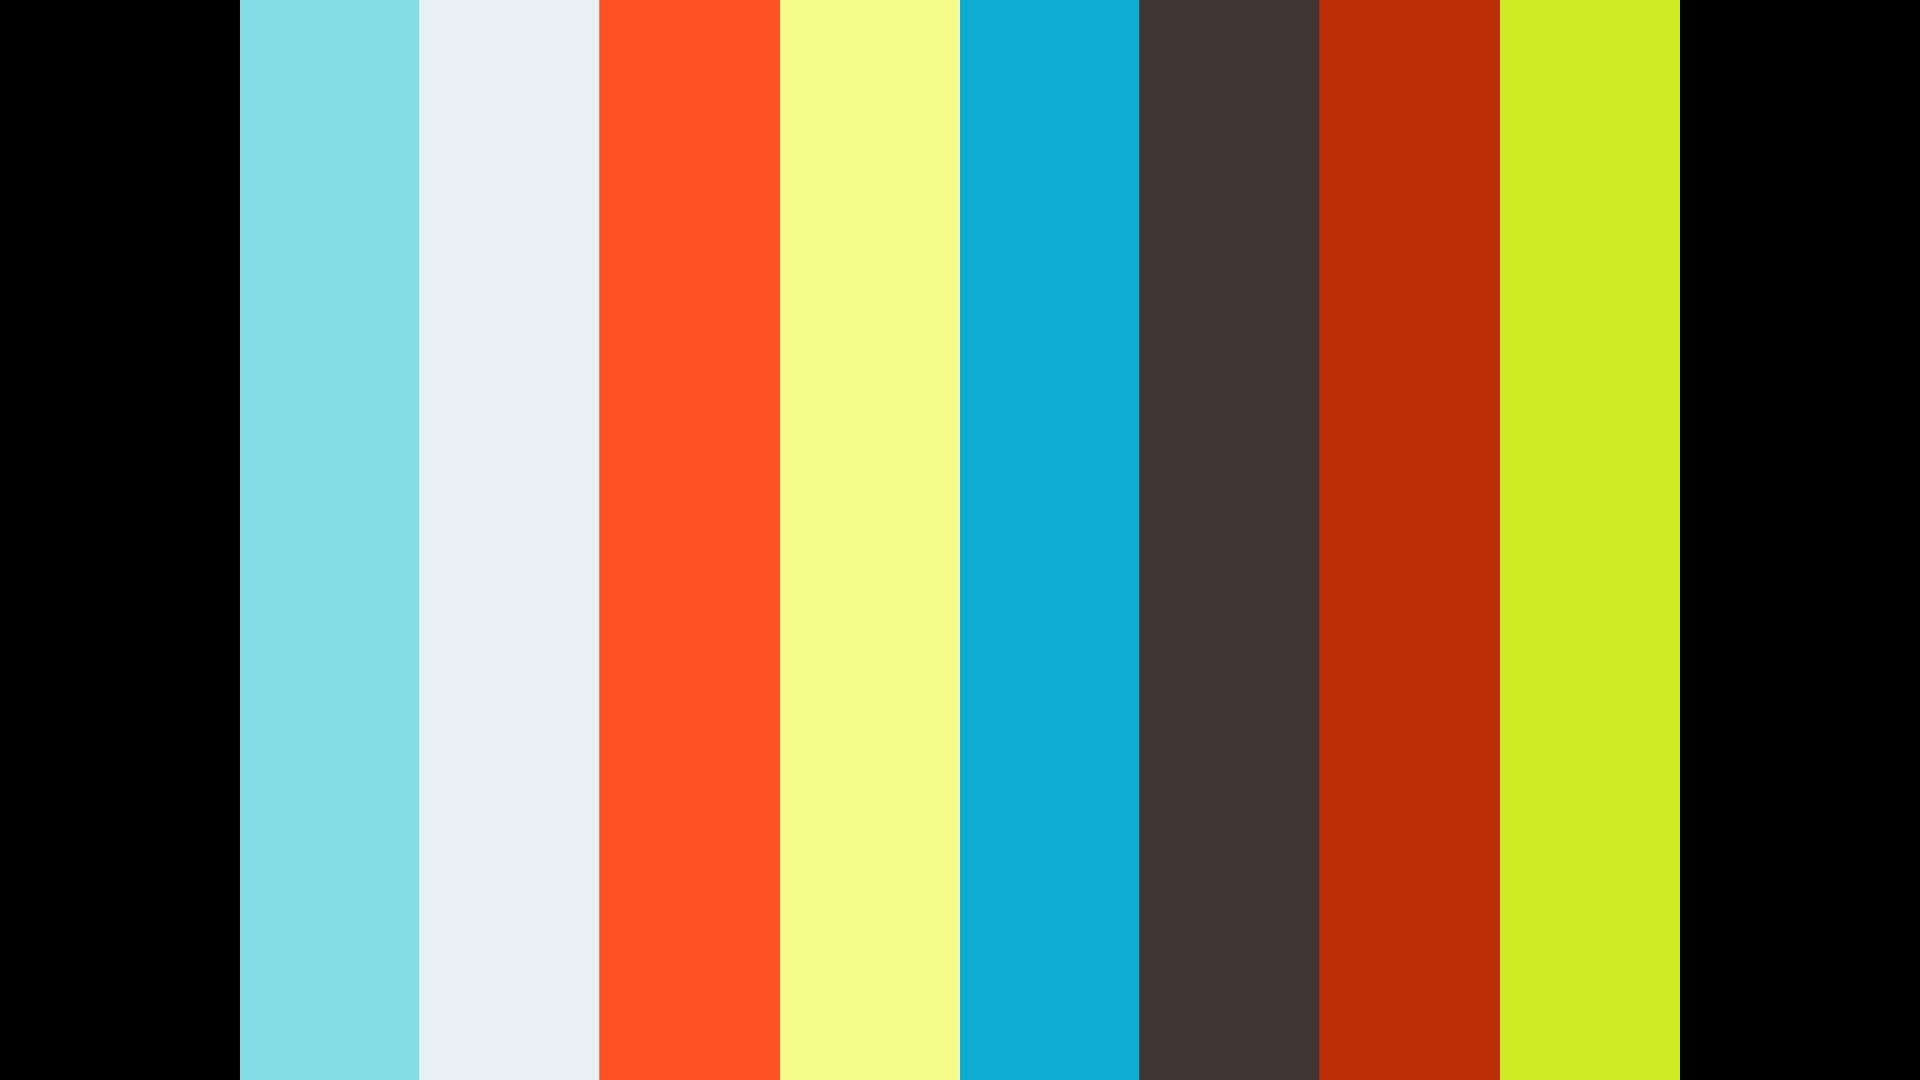 MAIS-Overall-2020-Game 14-MRA vs Riverdale (Boys)